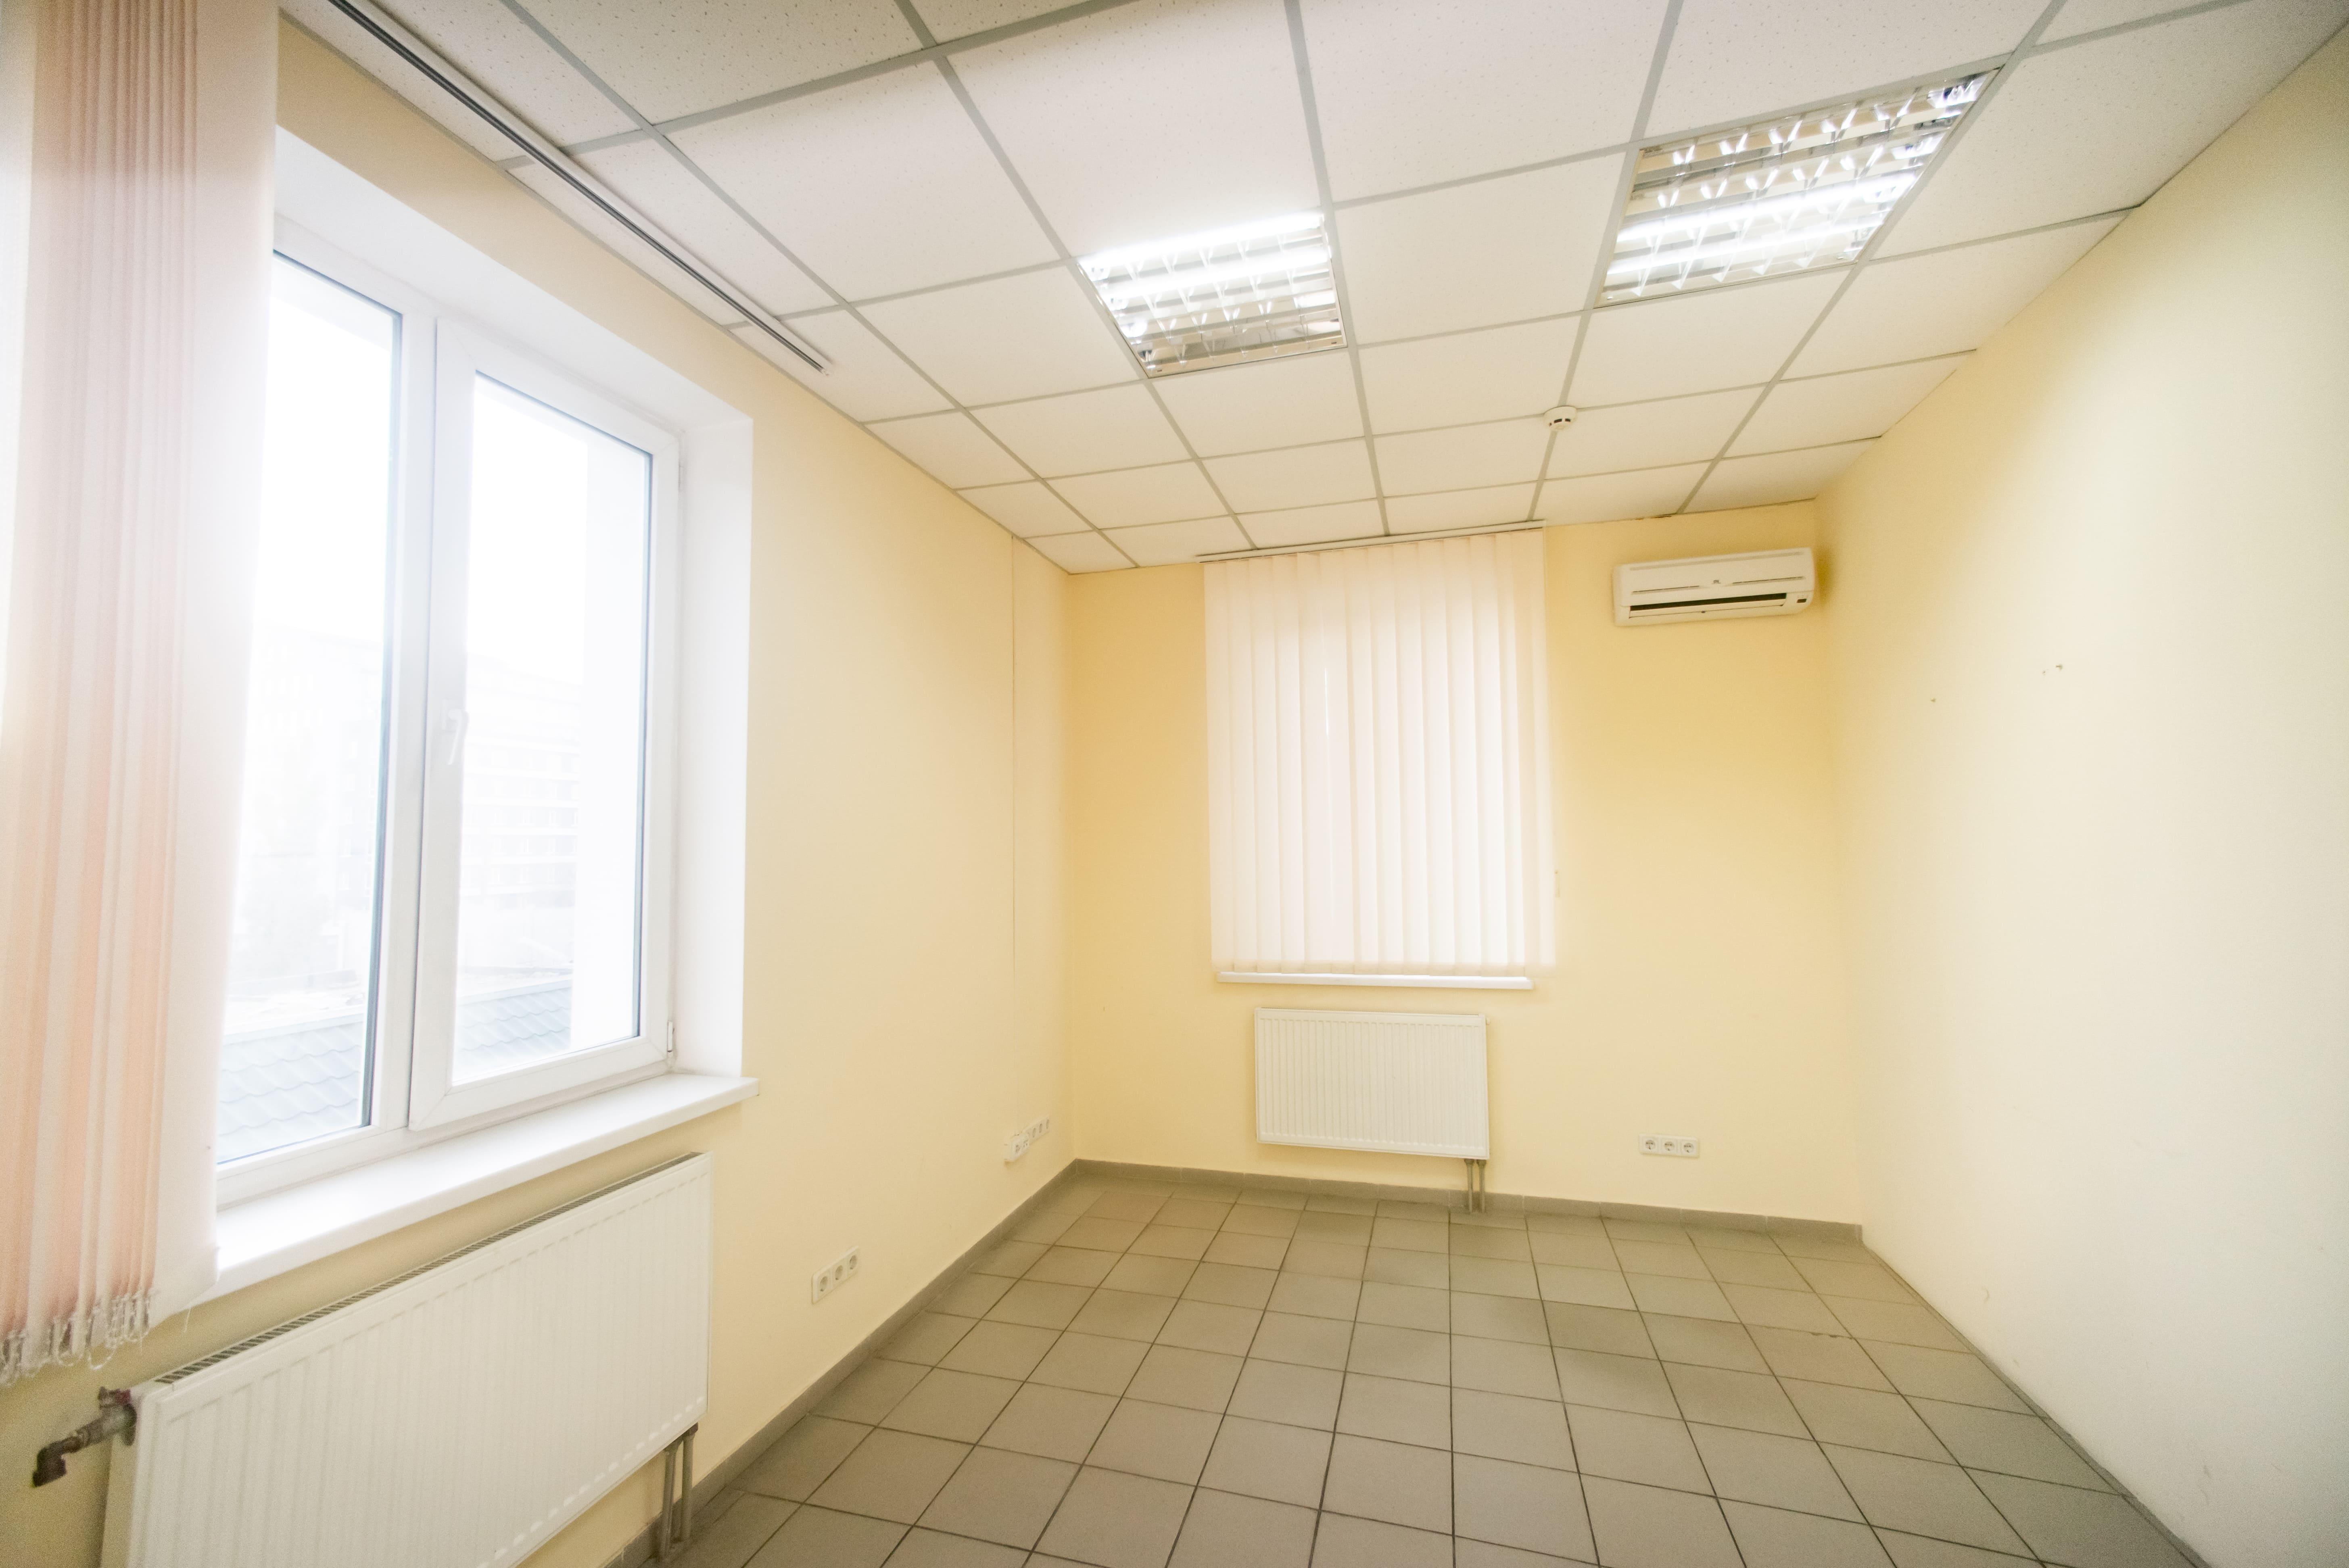 Mezhyhirskyi Business Center Photo 5